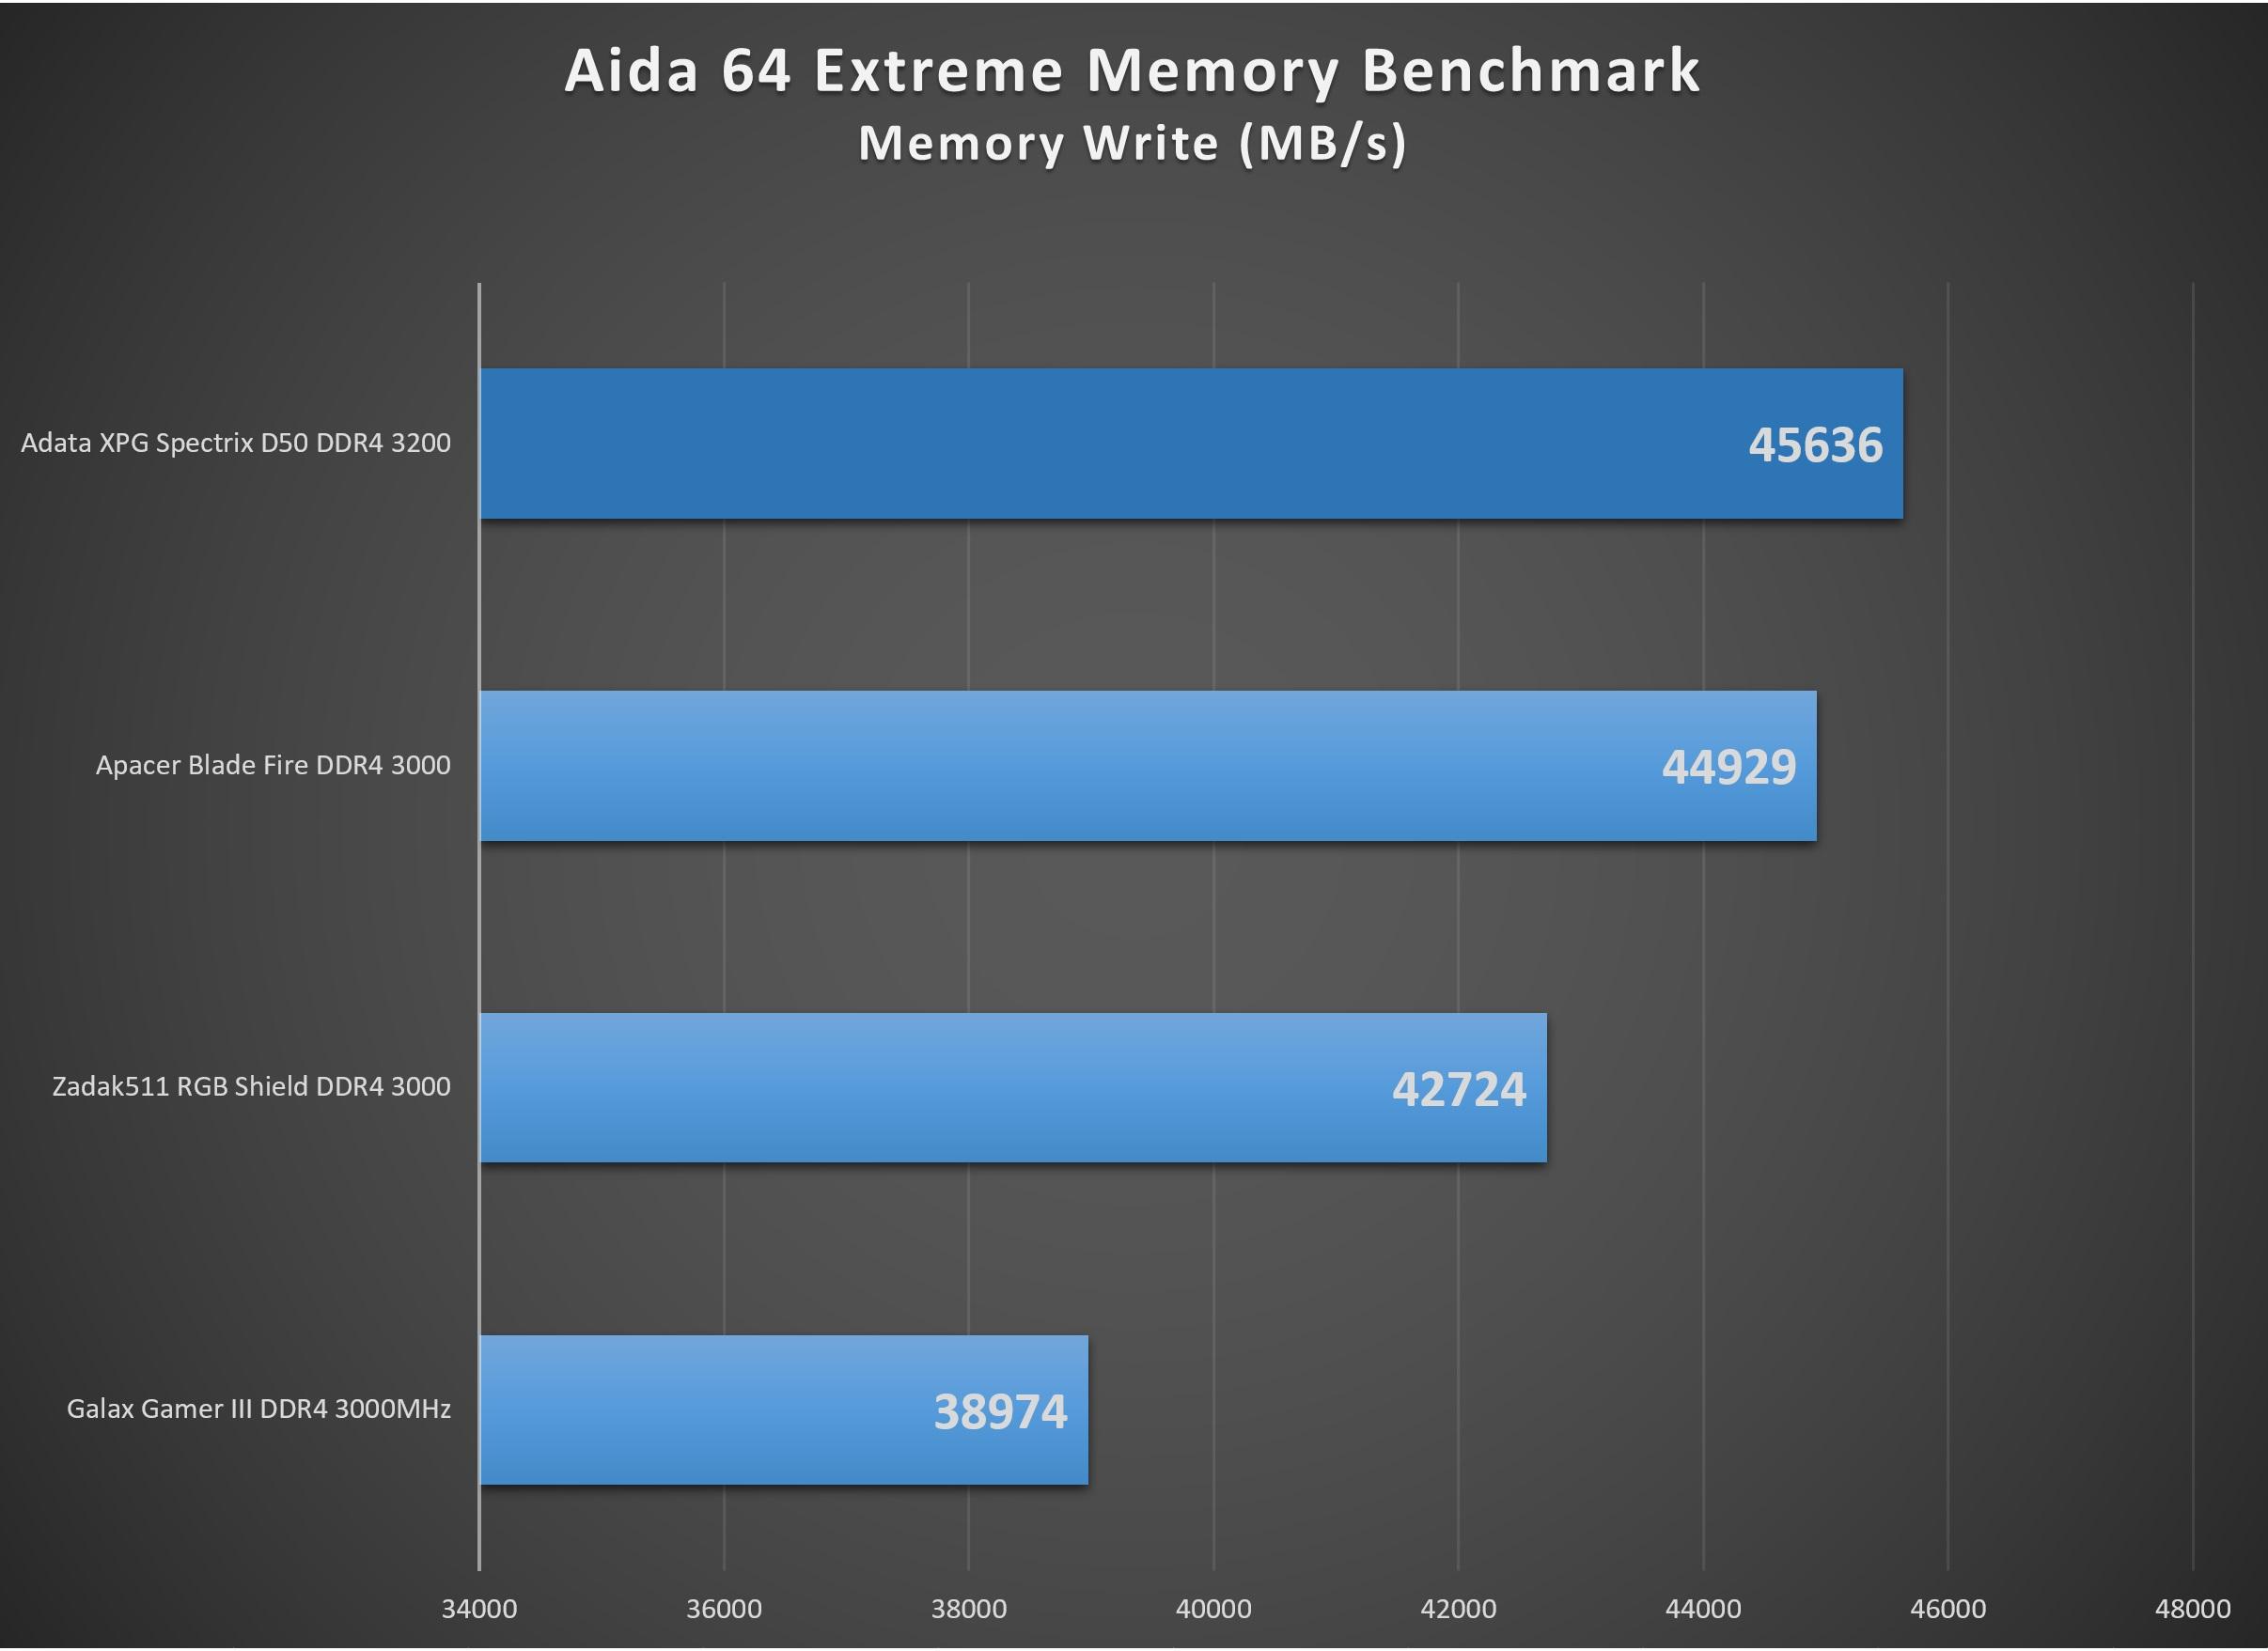 XPG_Spectrix_D50_3200-aida64_memorywrite